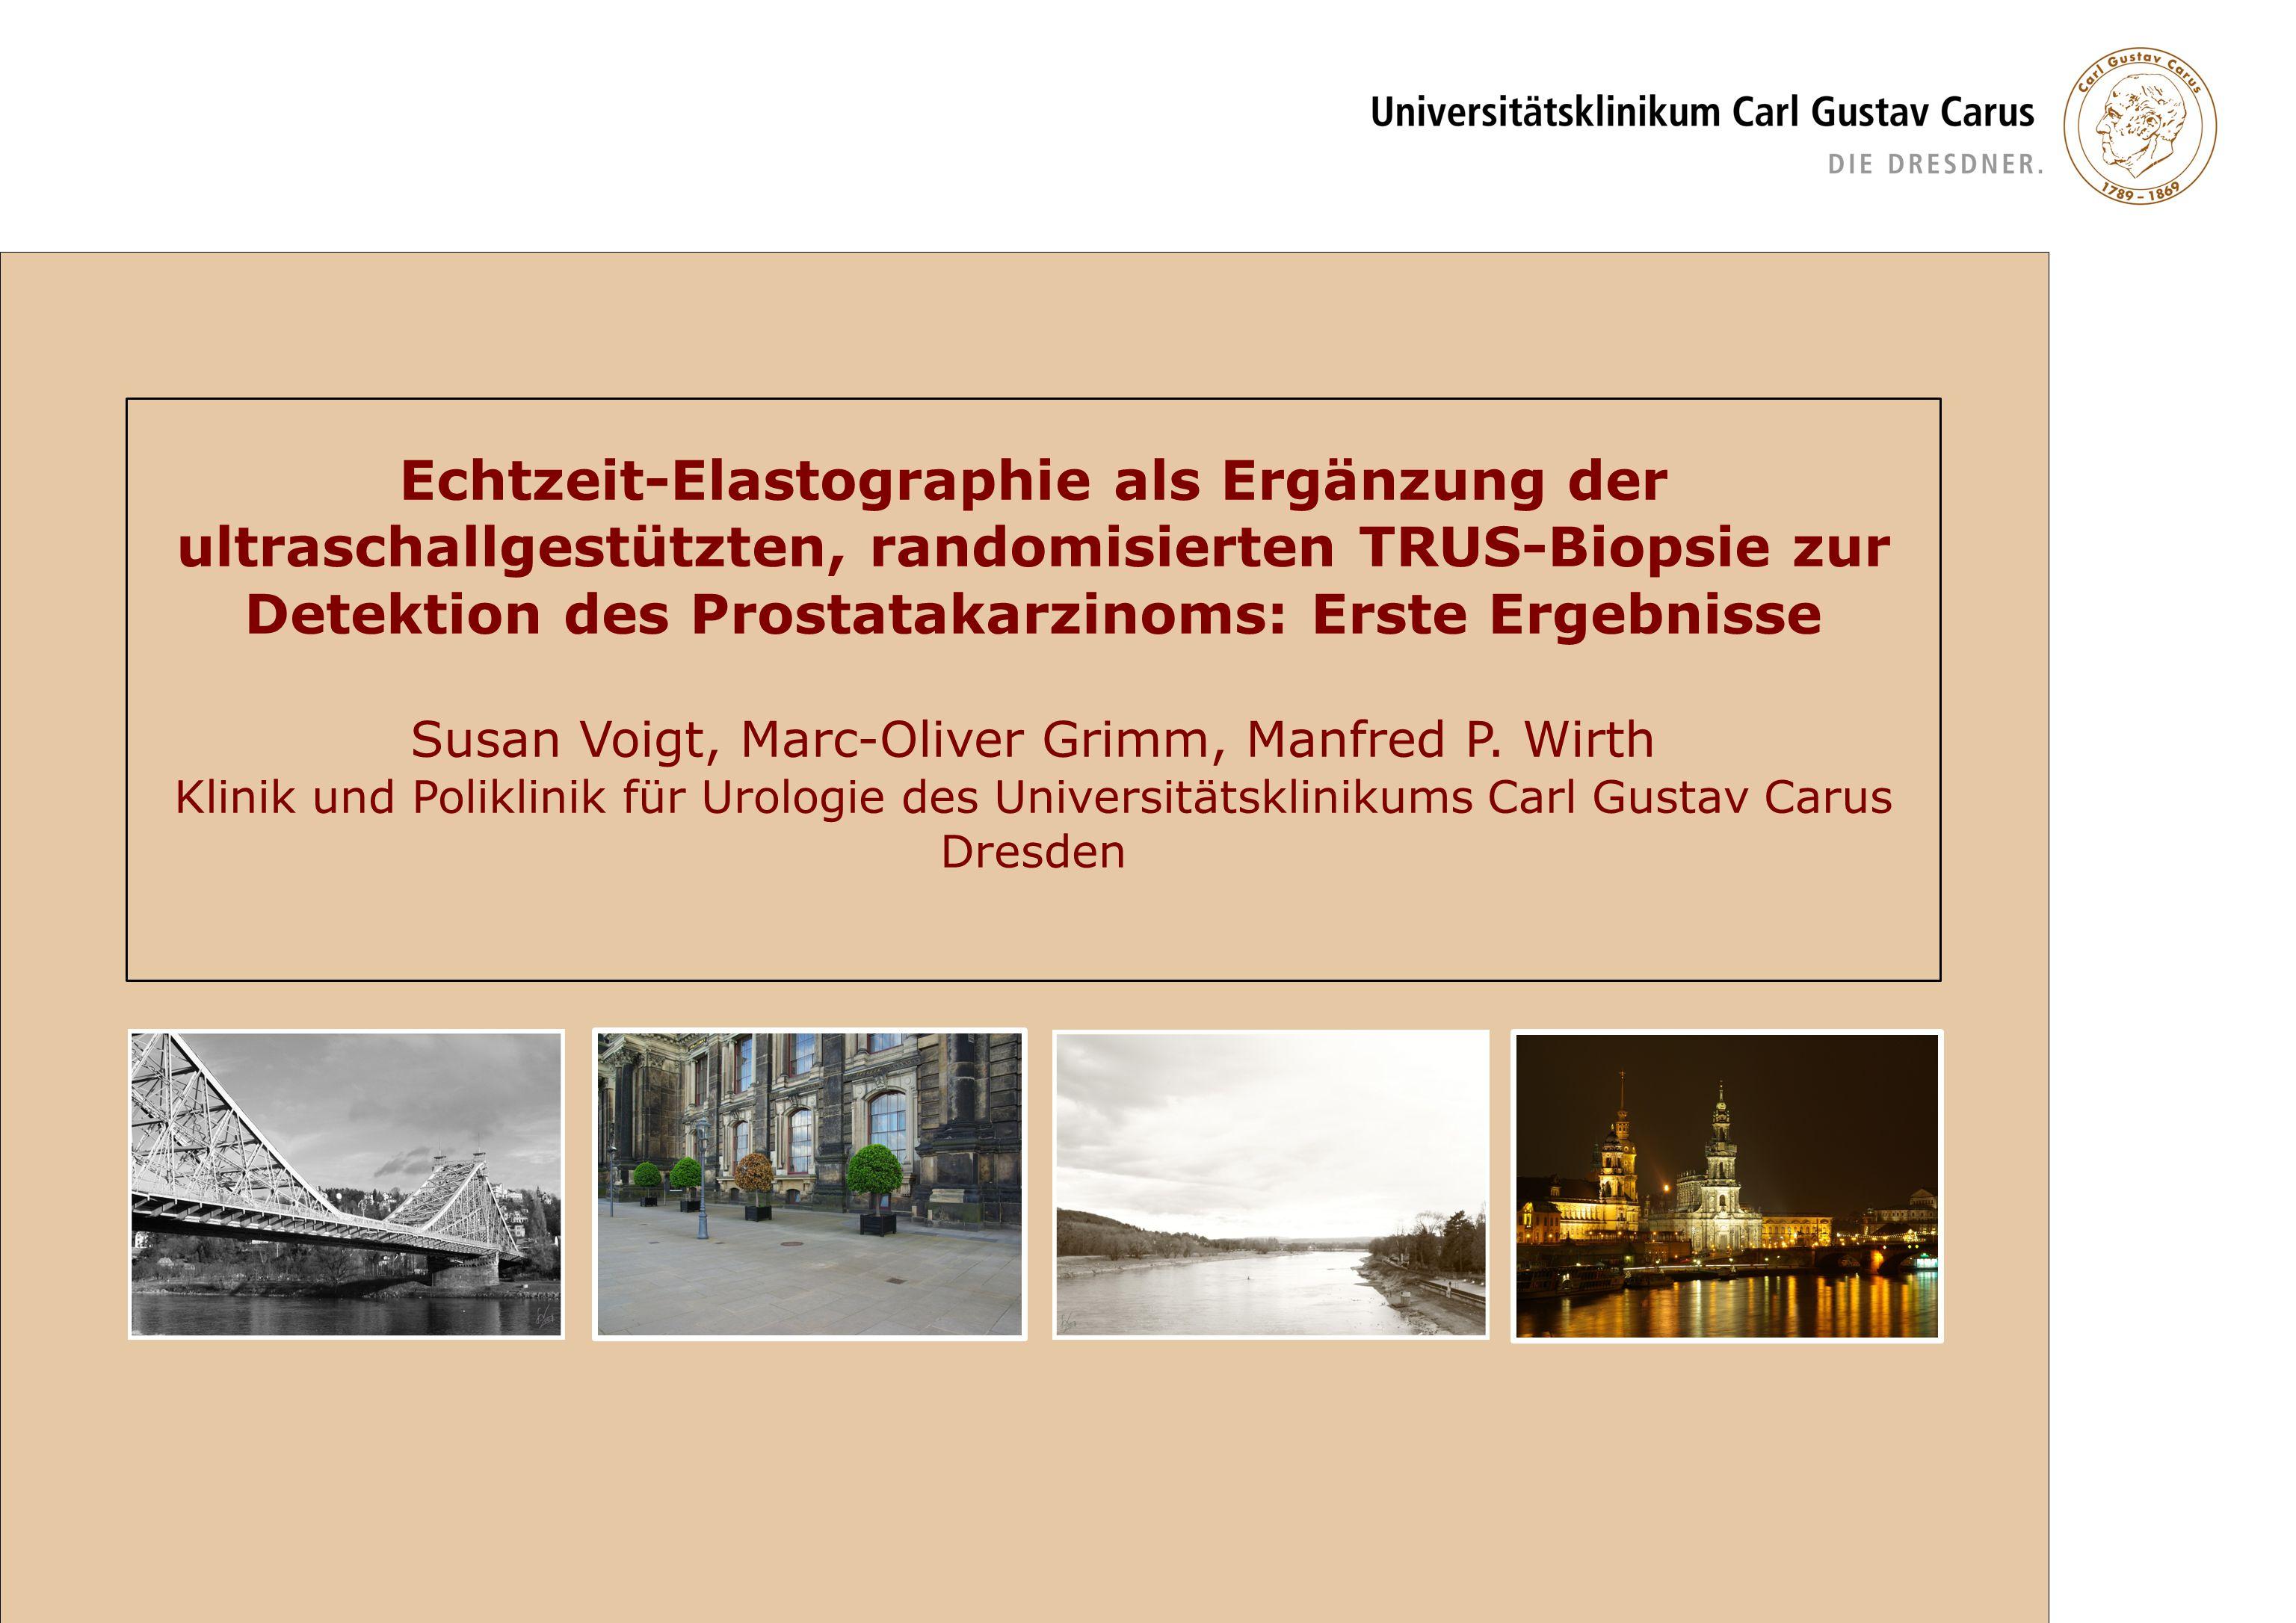 Susan Voigt, Marc-Oliver Grimm, Manfred P. Wirth